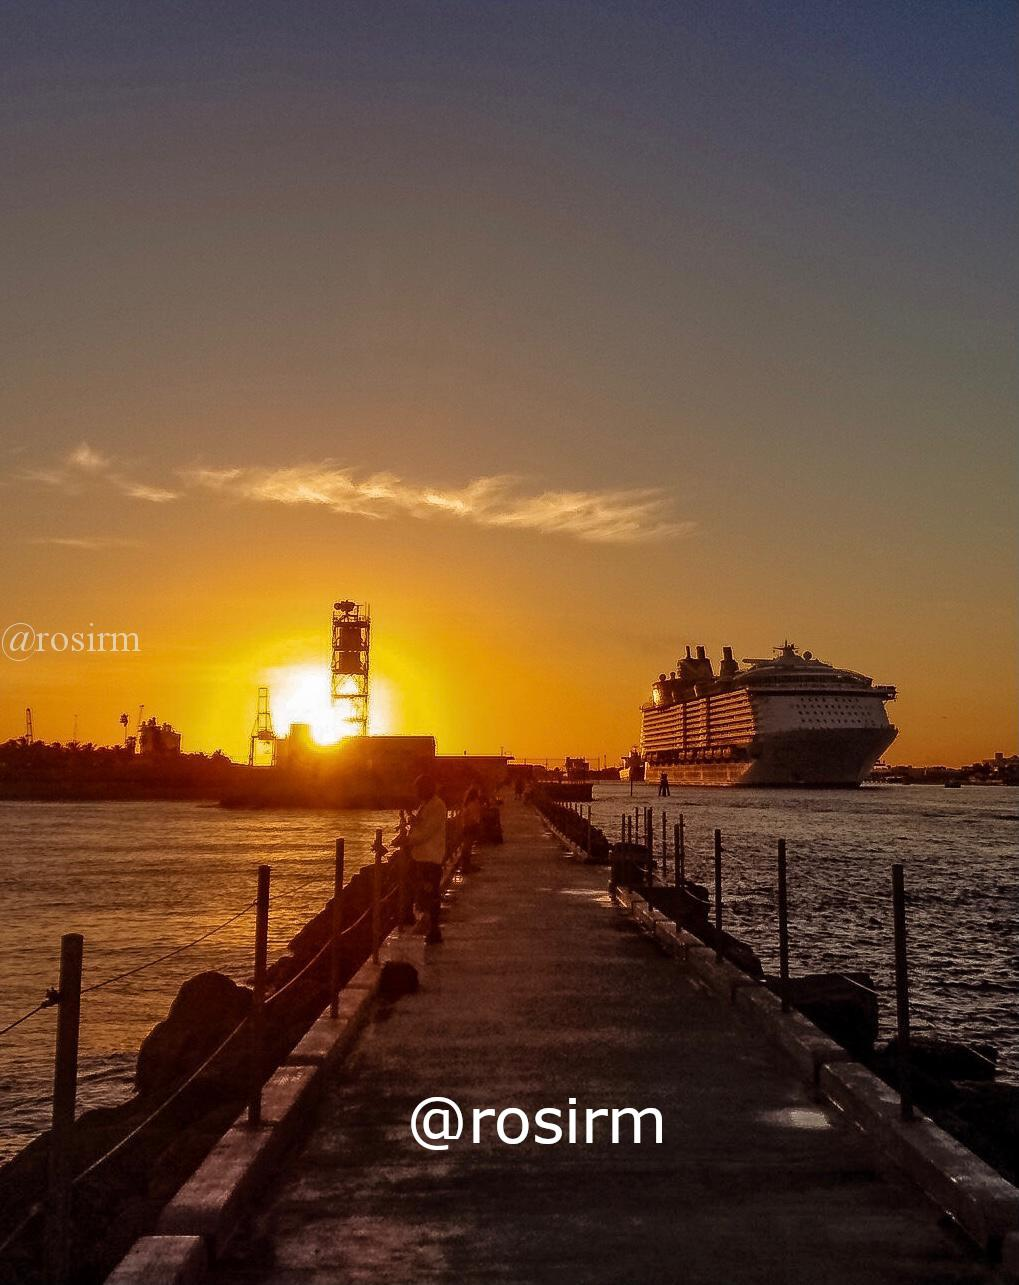 Fort Lauderdale Port Everglades